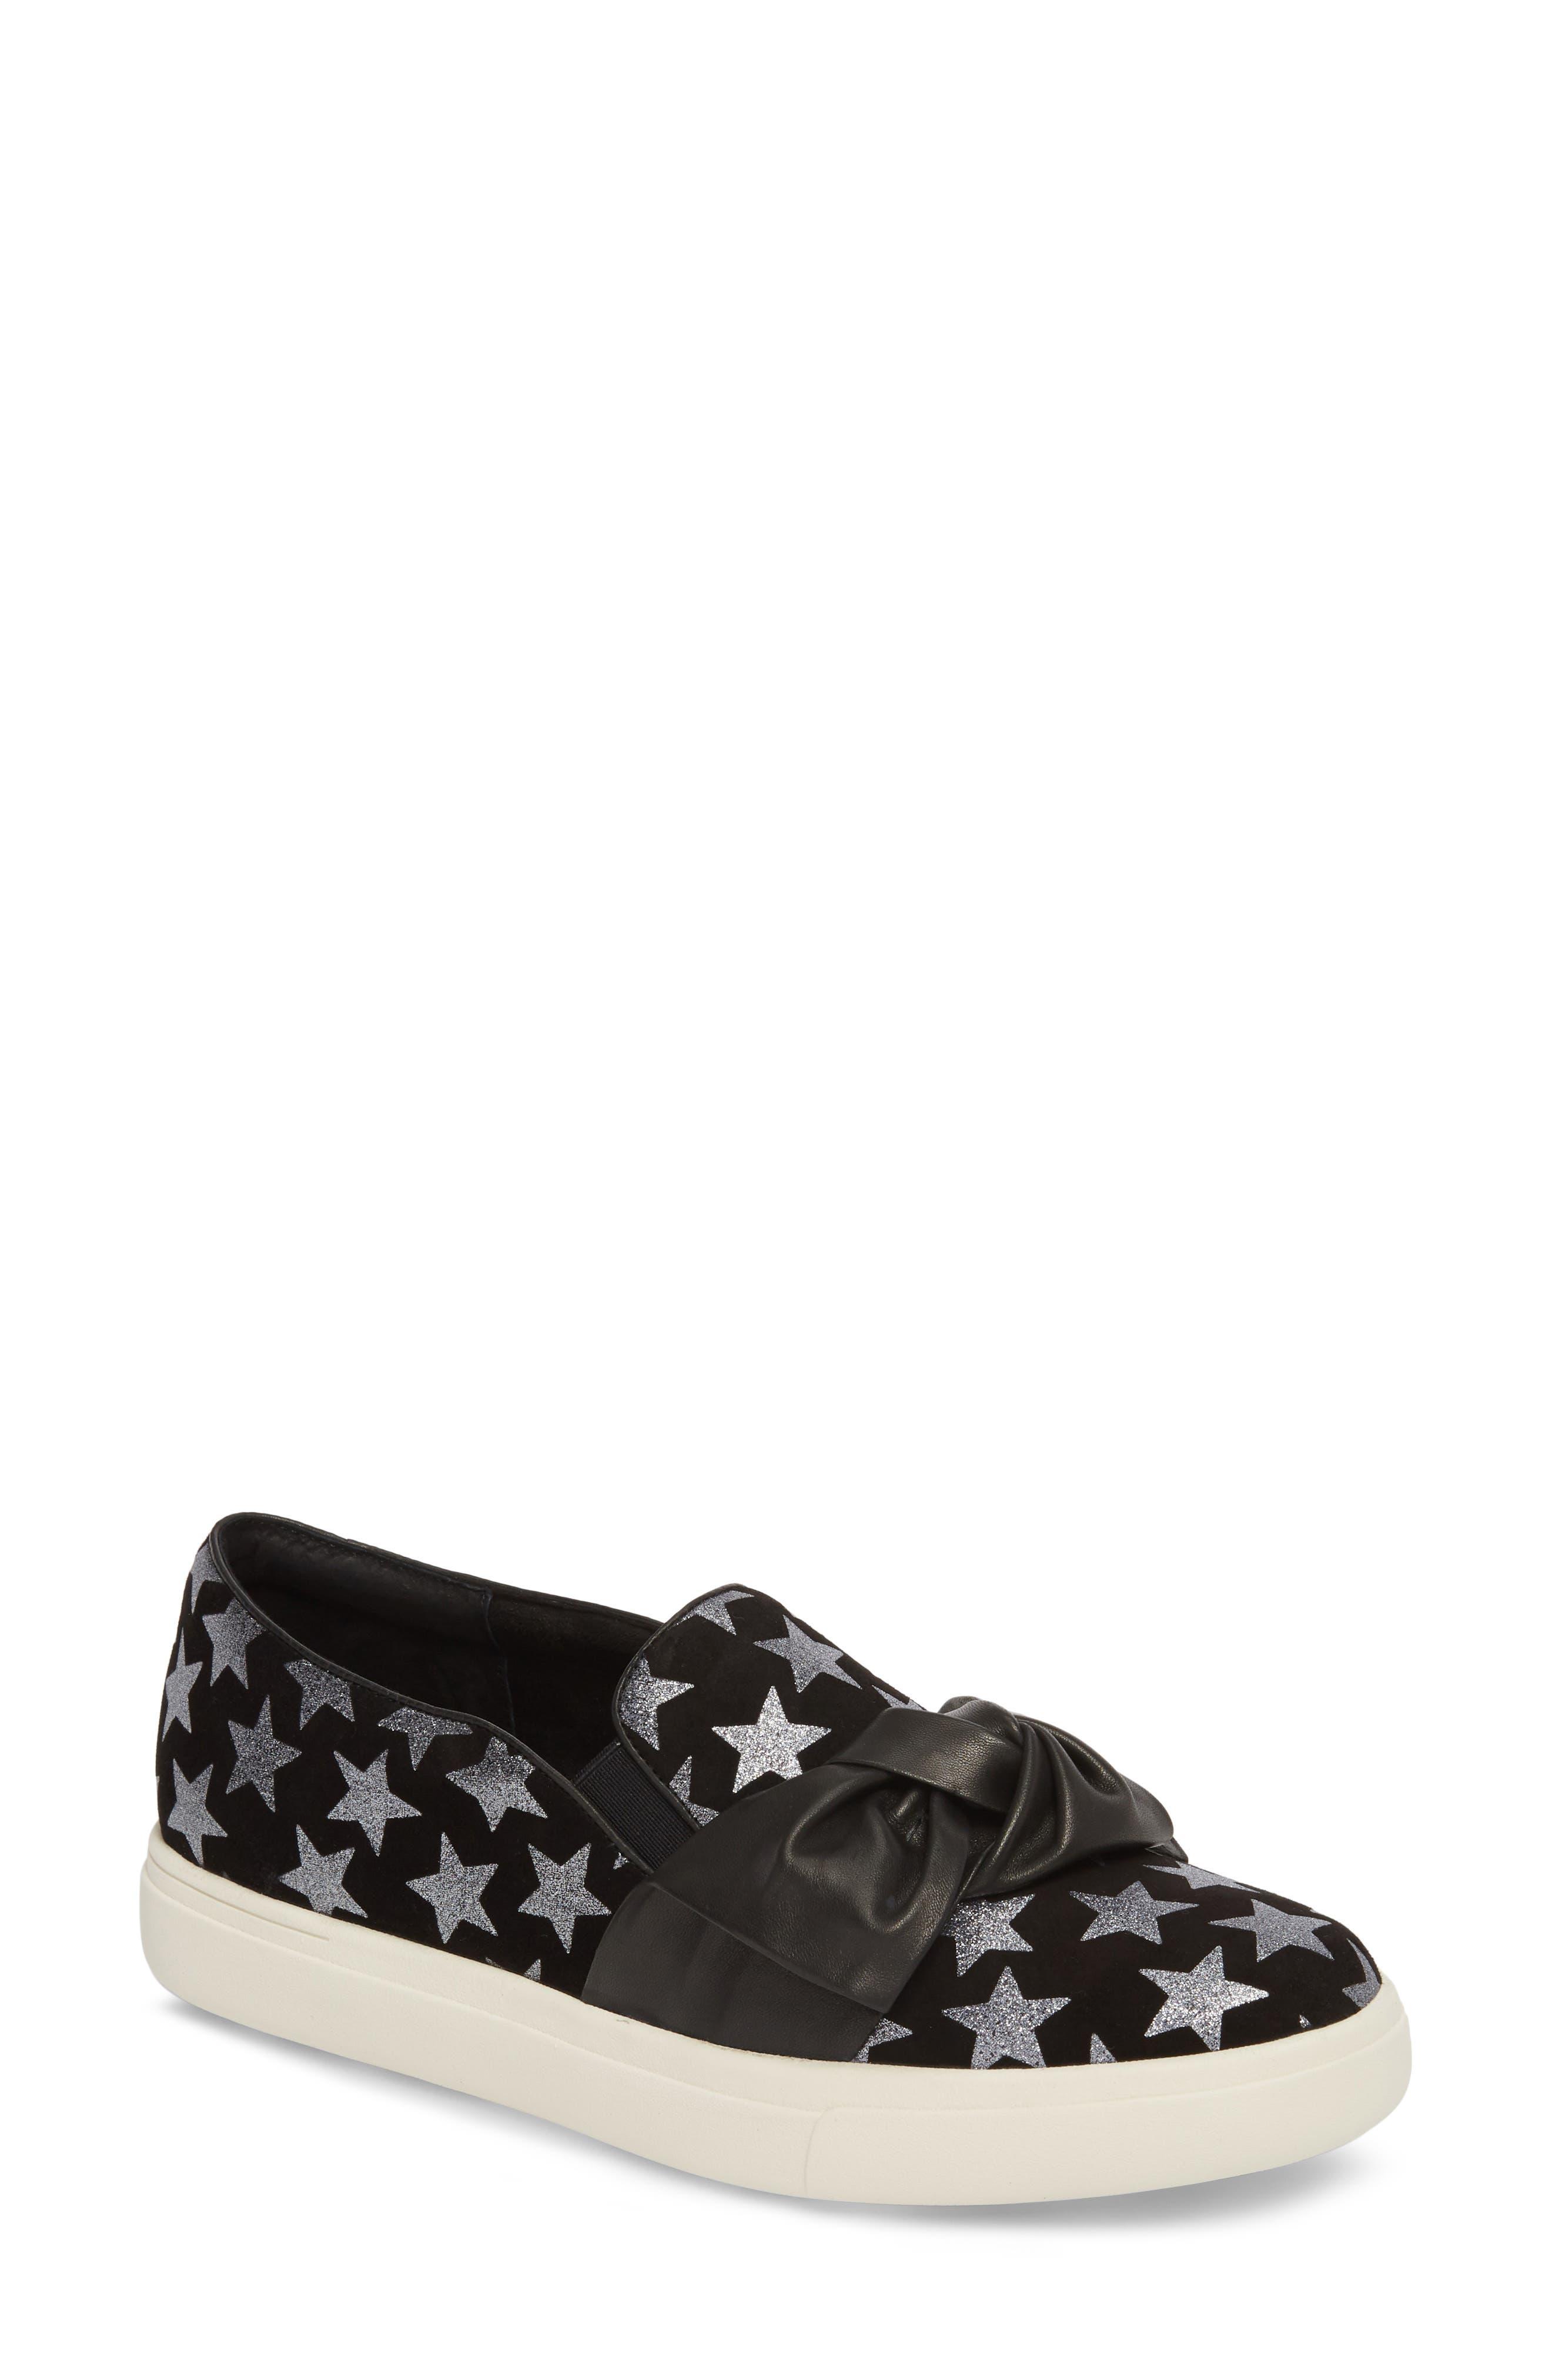 VANELI,                             Odelet Slip-On Sneaker,                             Main thumbnail 1, color,                             BLACK/ PEWTER SUEDE